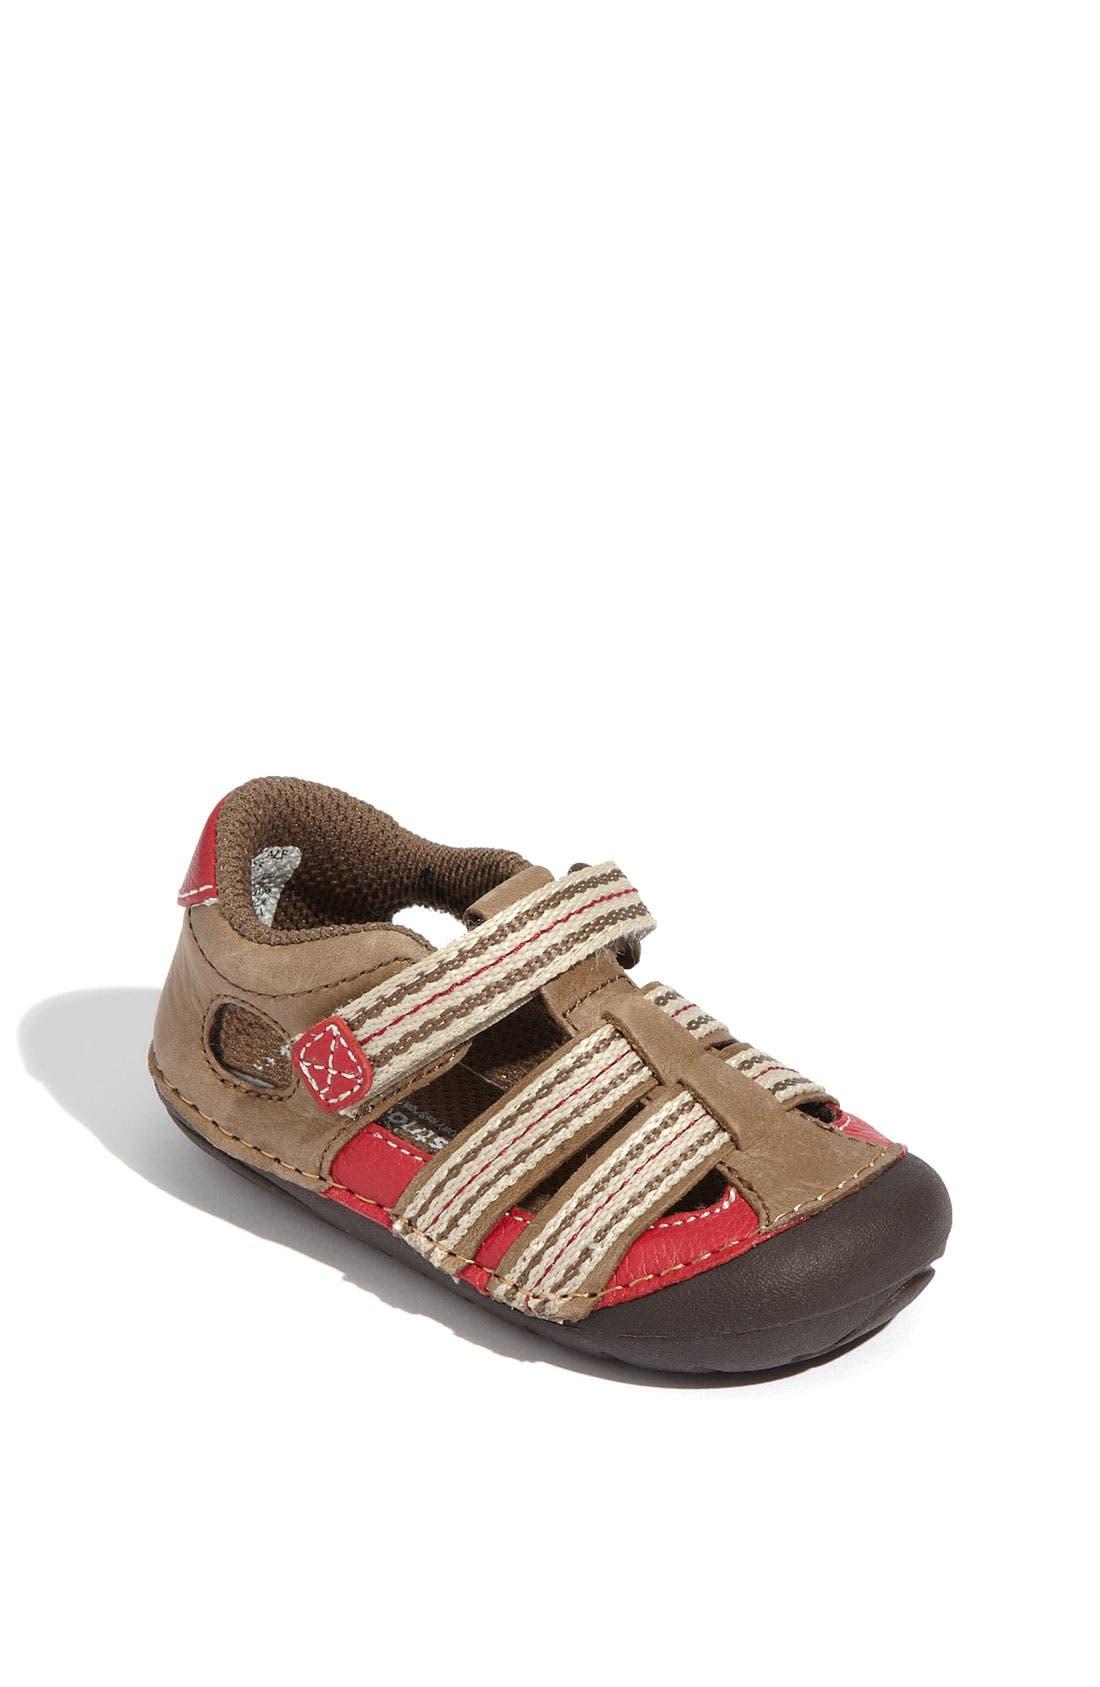 Alternate Image 1 Selected - Stride Rite 'Calf' Sandal (Baby & Walker)